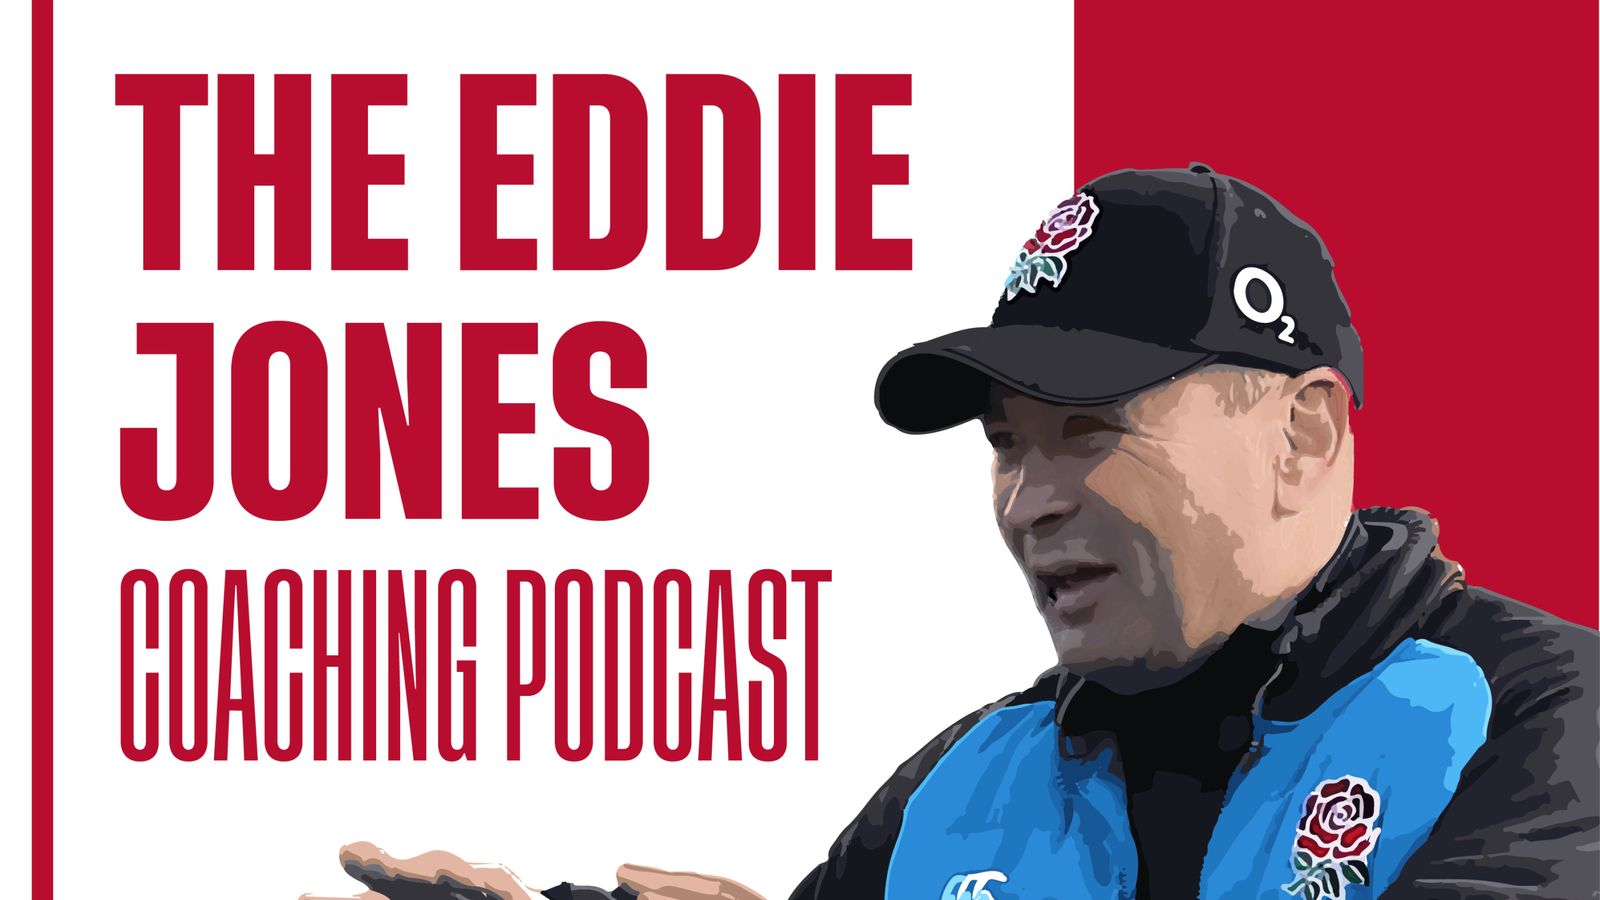 Eddie Jones on a coach's